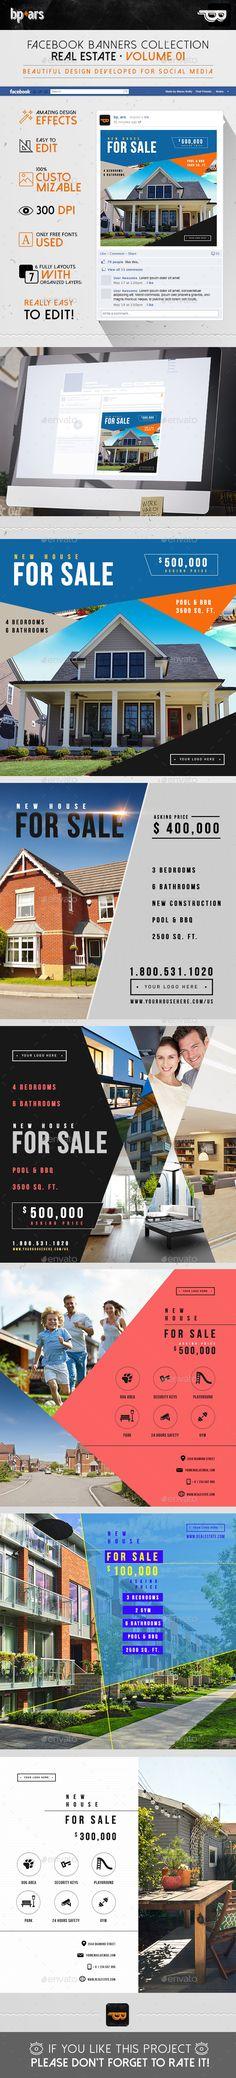 5 Facebook Banners Posts | Real Estate vol I